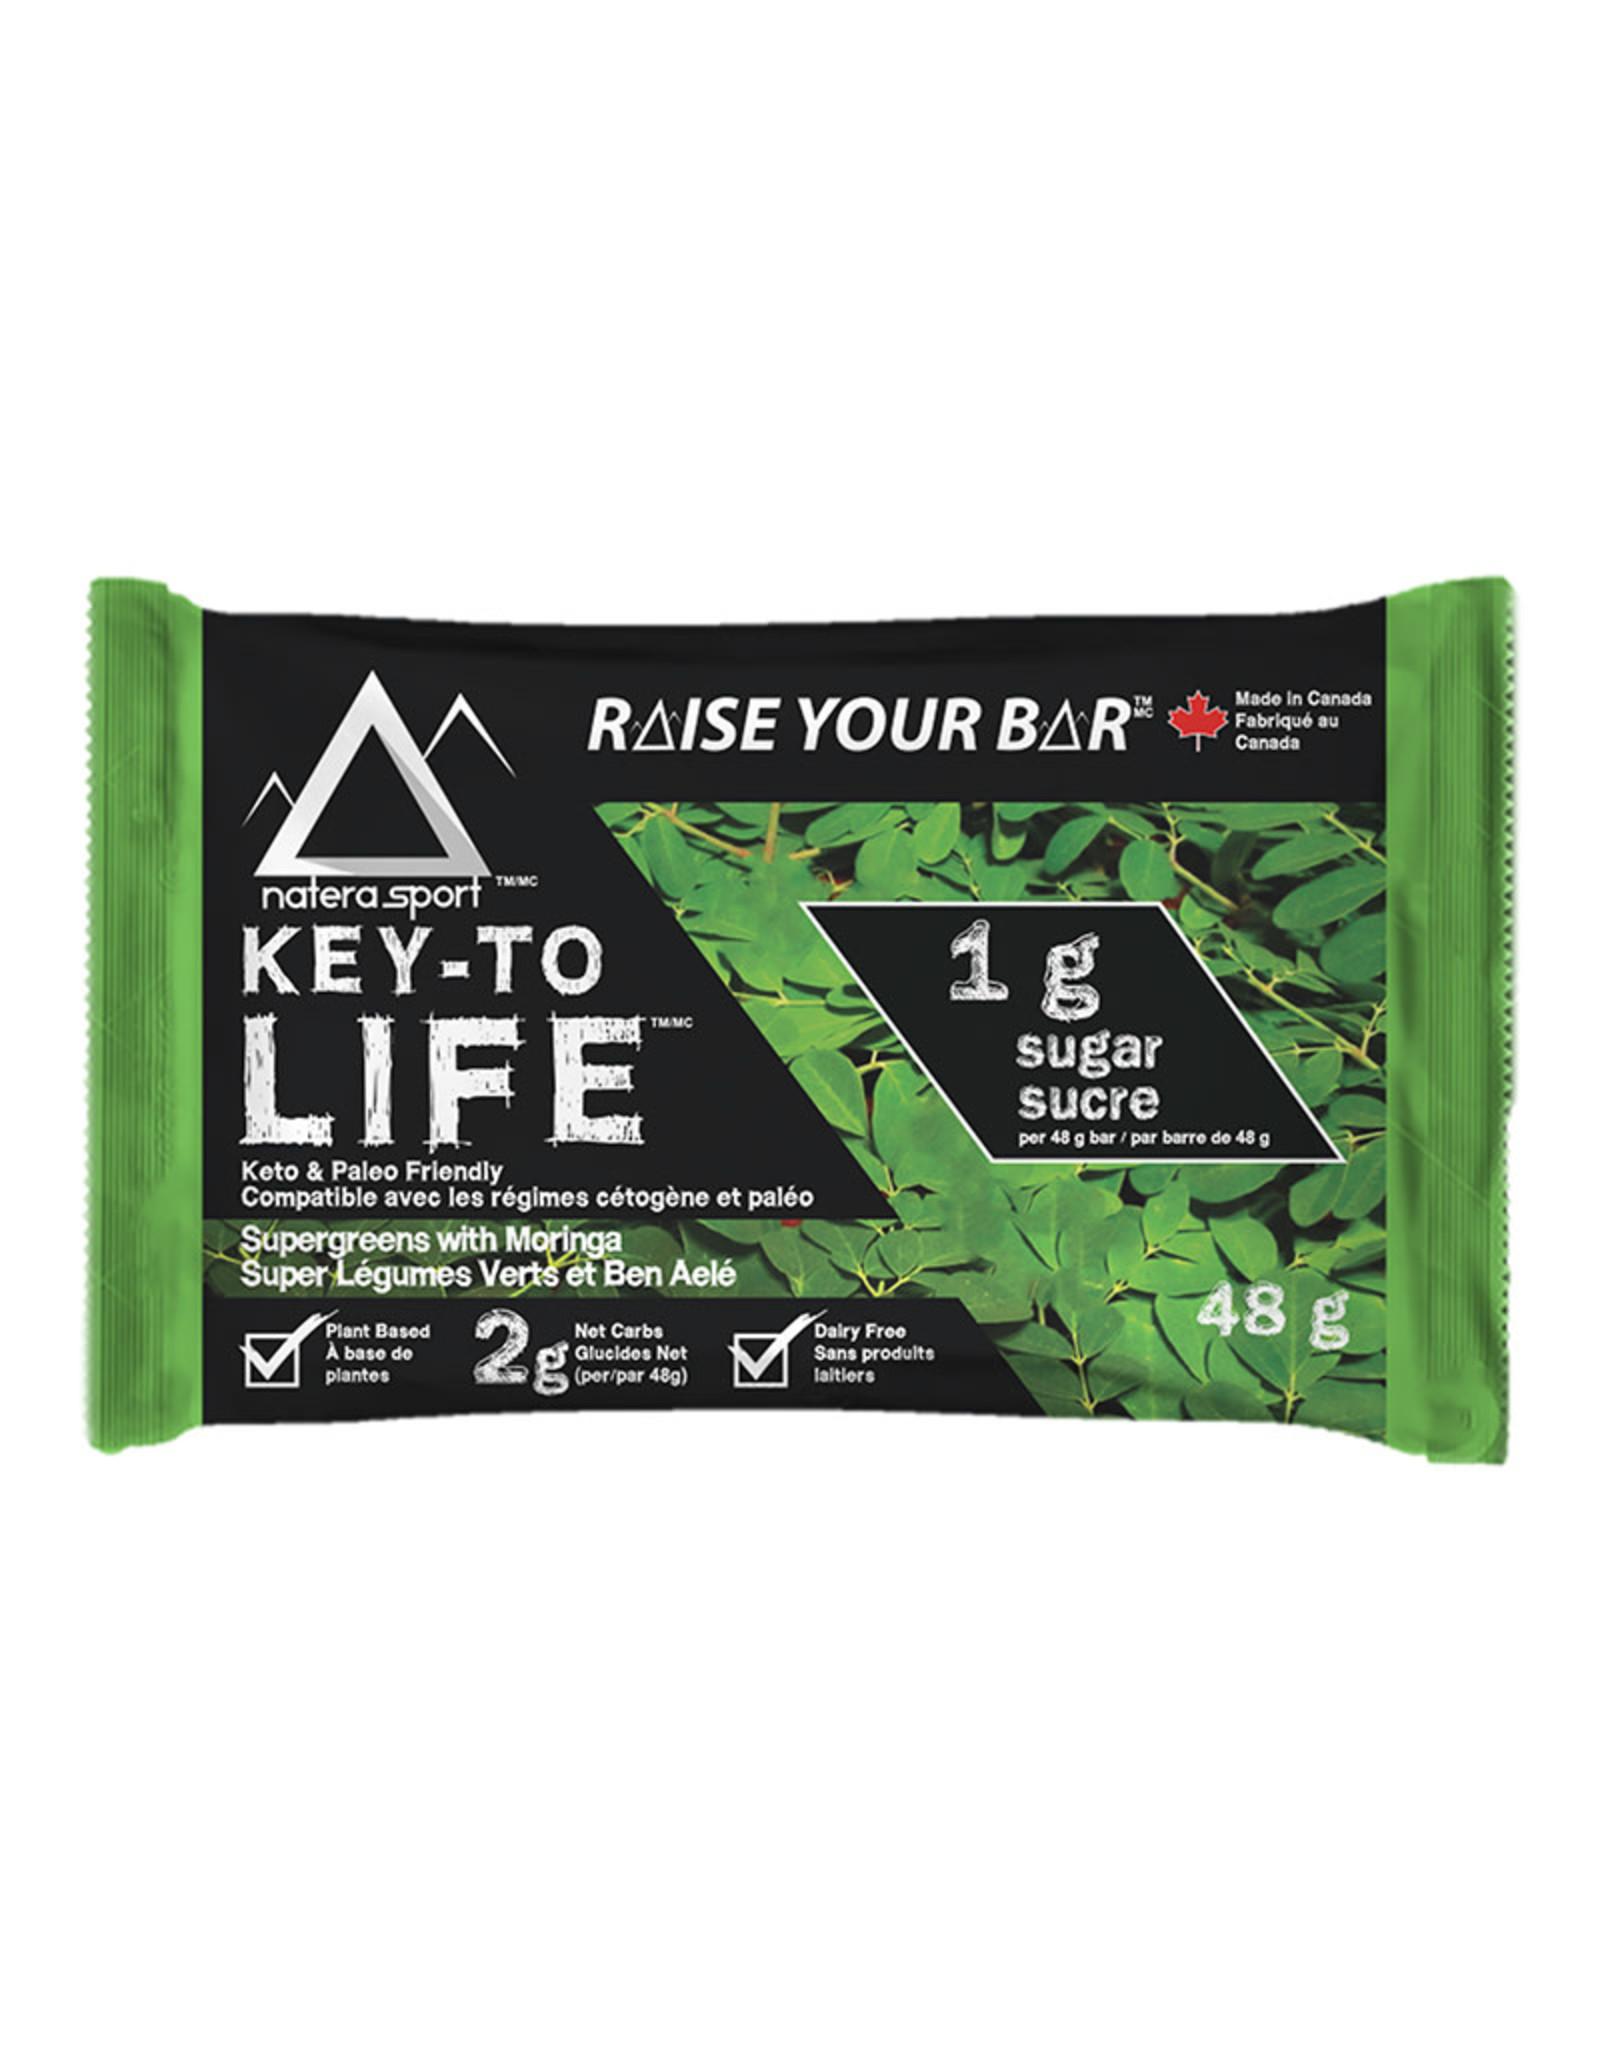 Key-To Life Key-to Life - Keto Bar, Supergreens with Moringa